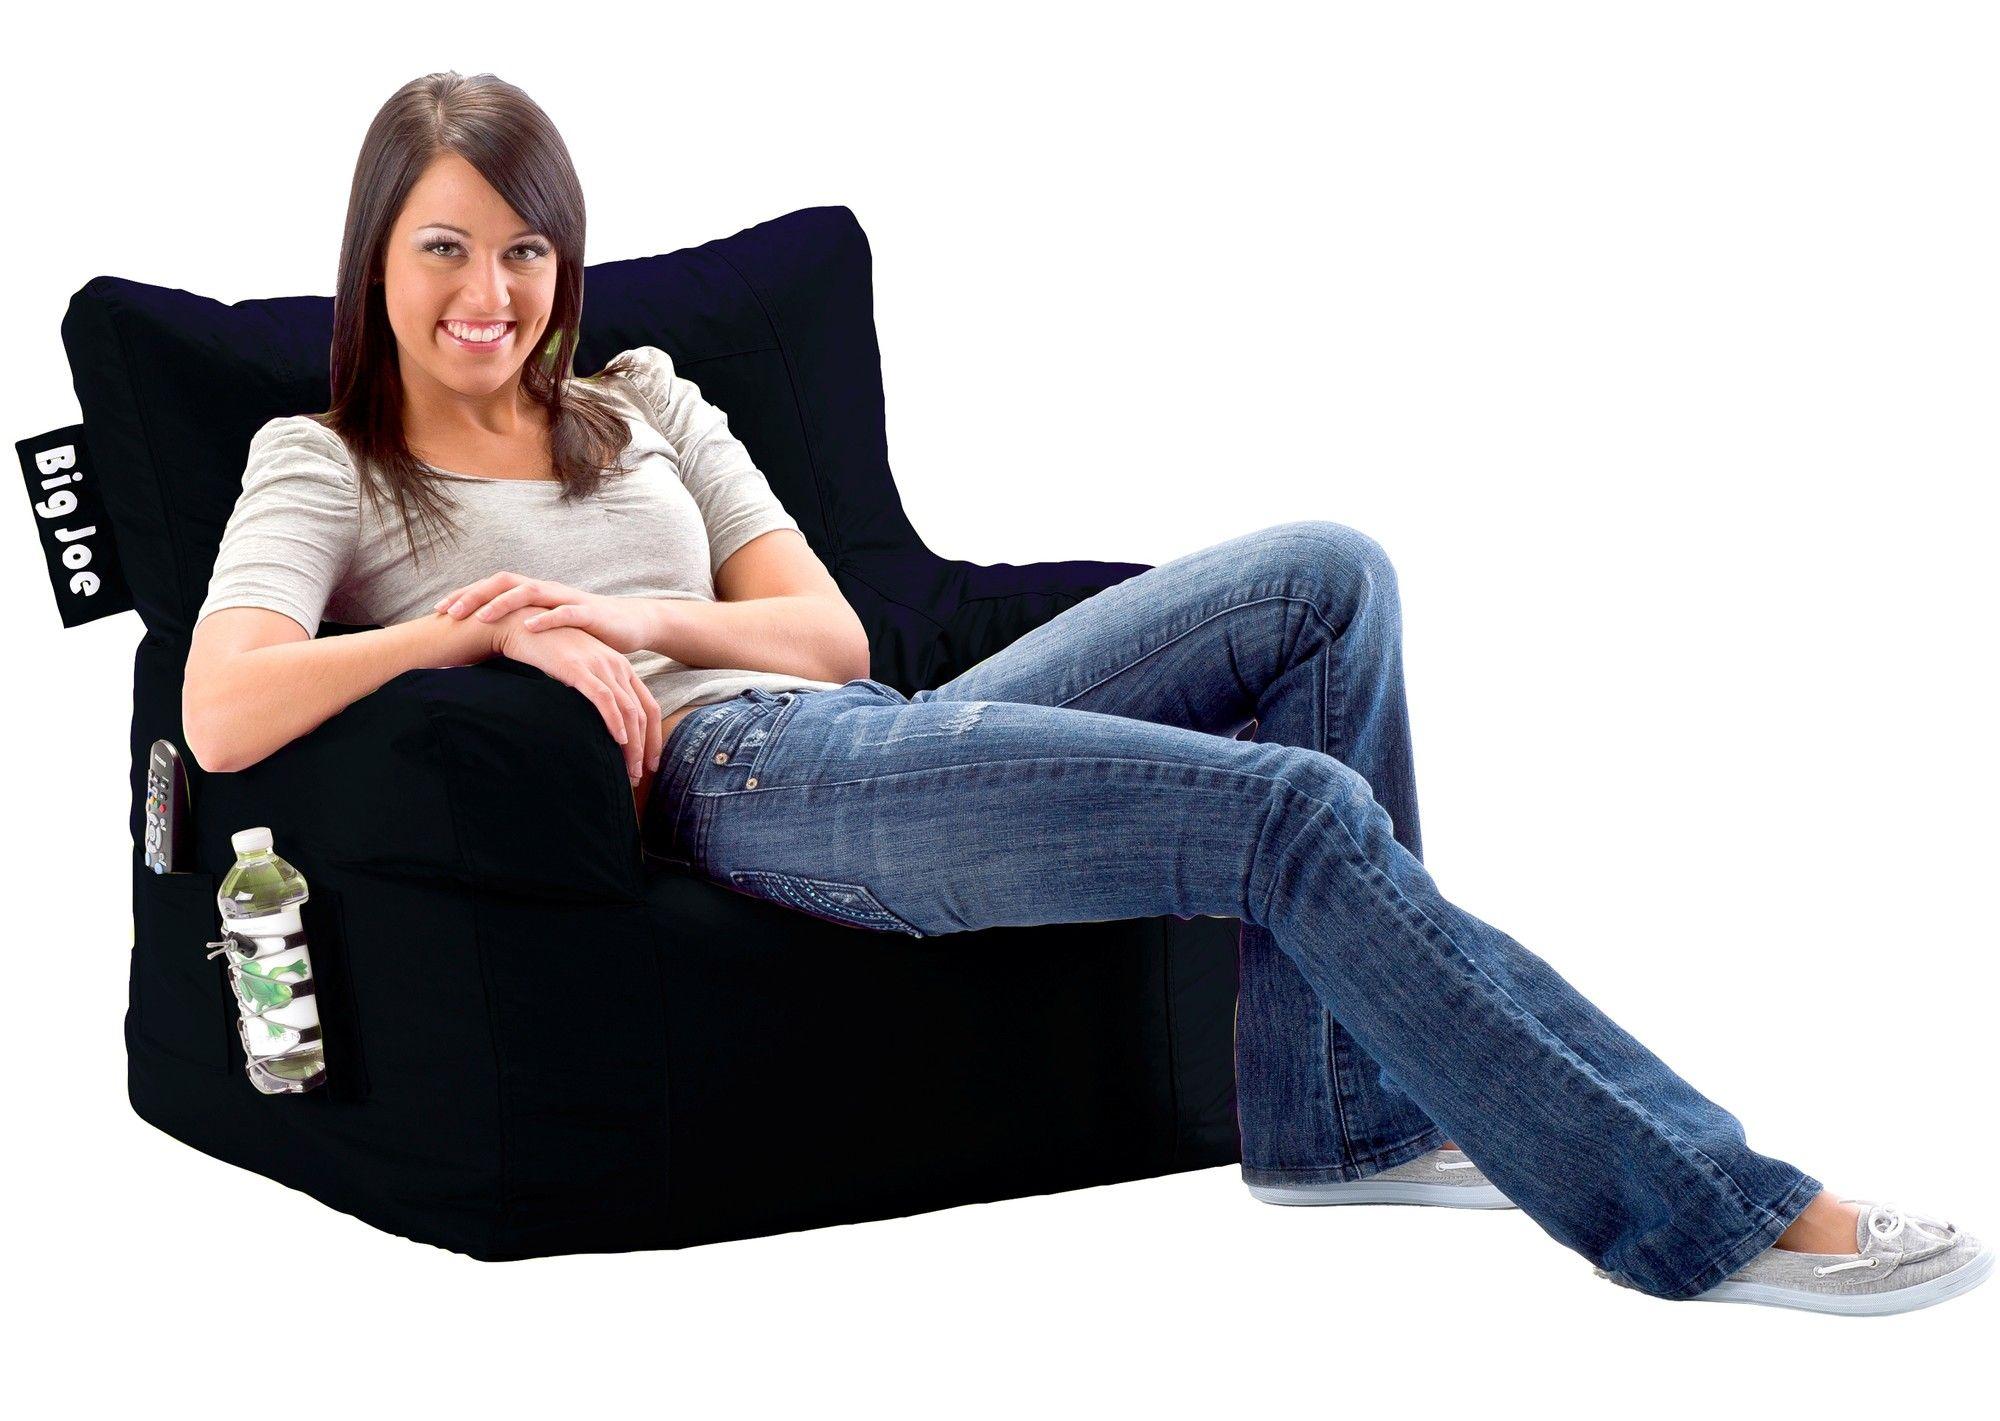 Standard Bean Bag Chair & Lounger (With images) Bean bag